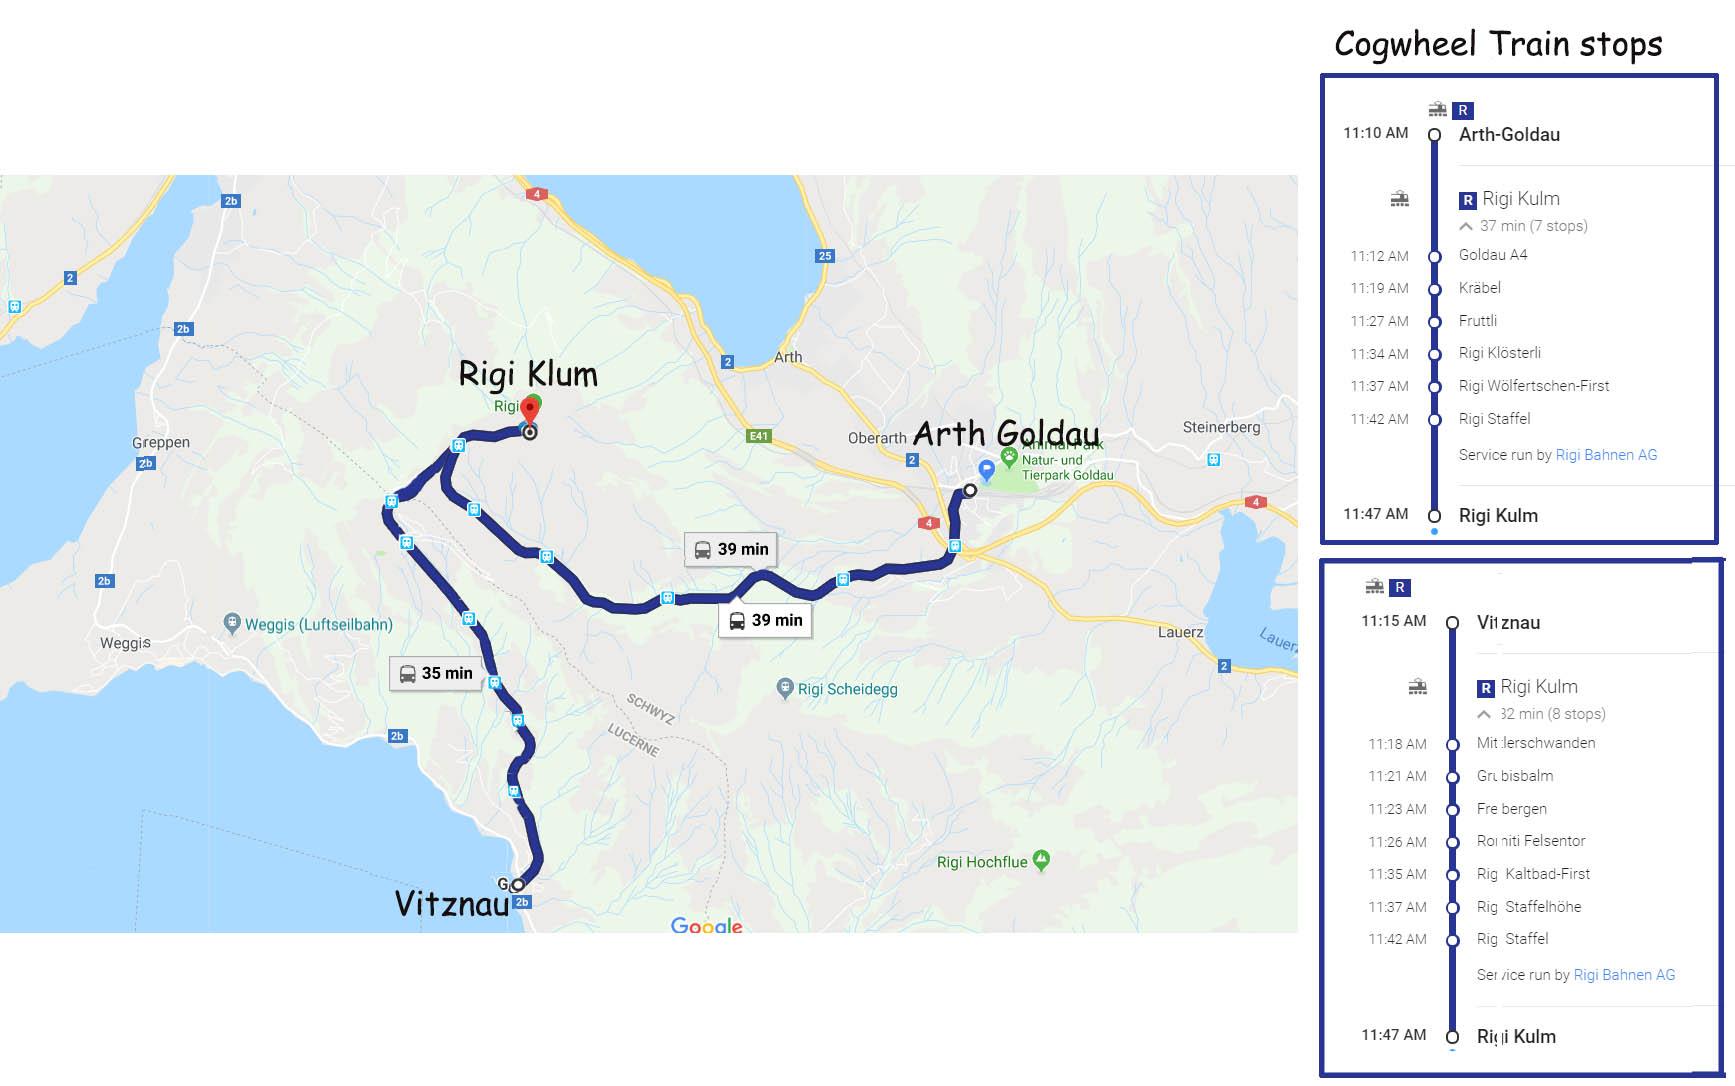 Rigi cogwheel routes and train stops